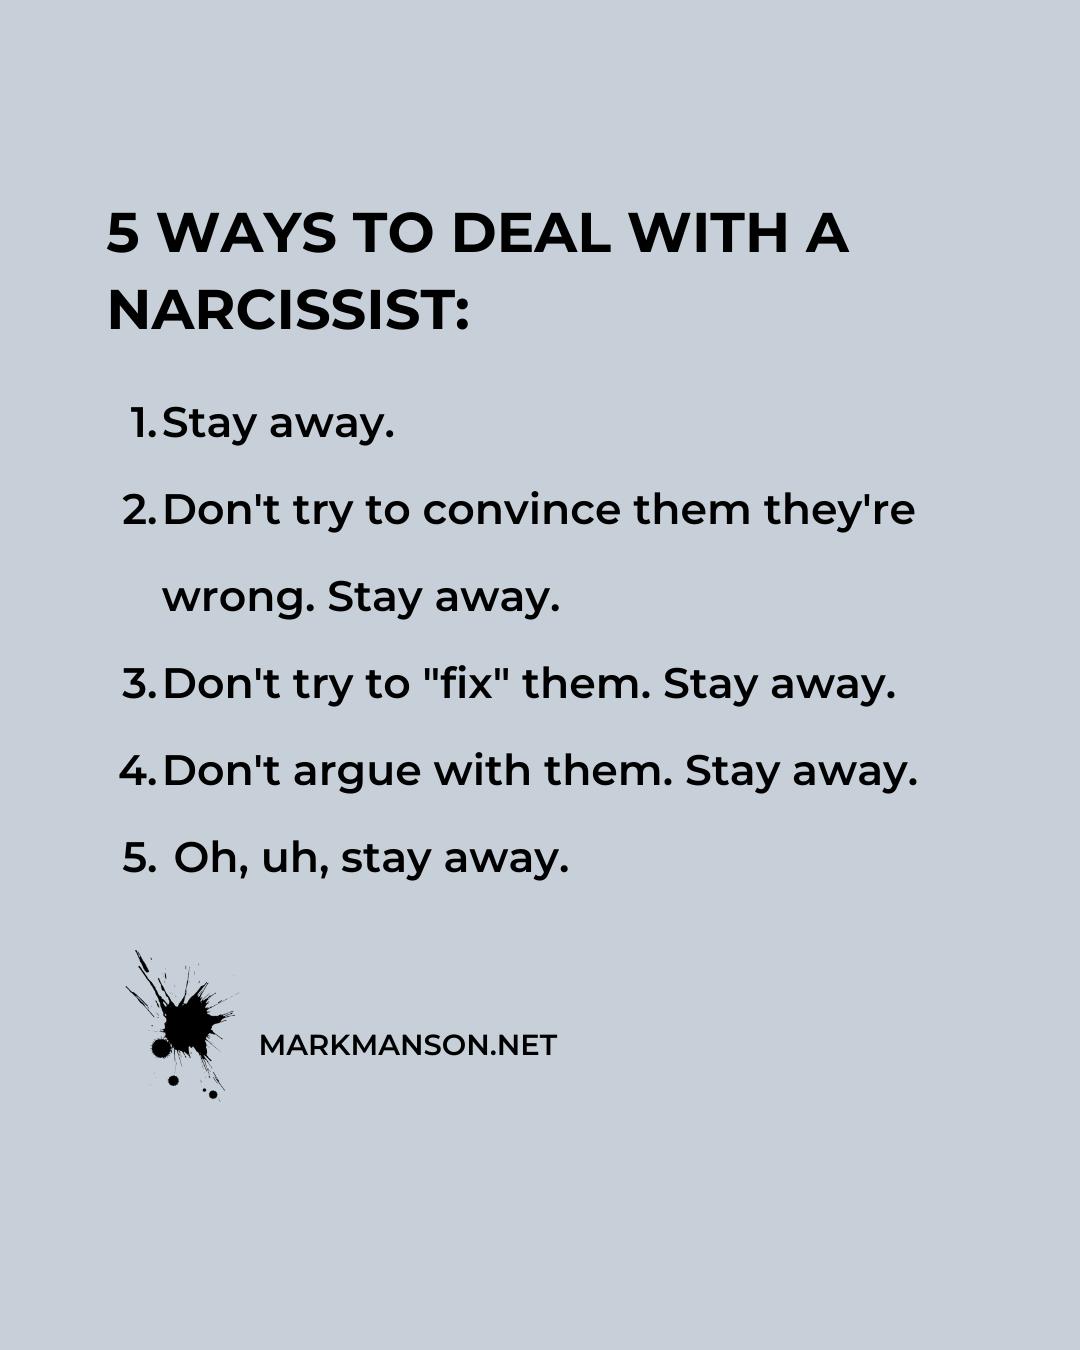 Mark Manson - Life Advice That Doesn't Suck